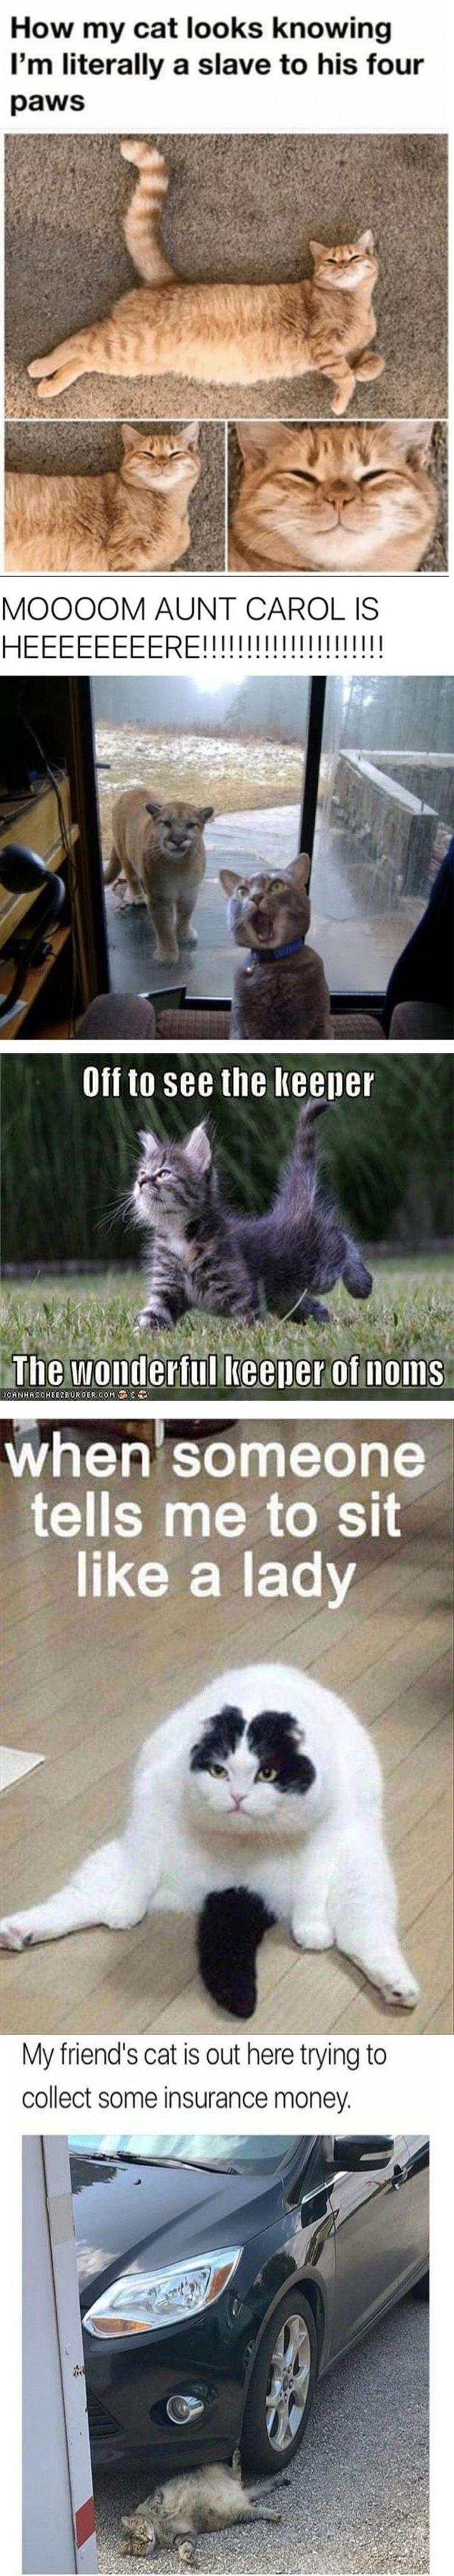 Cat Meme Of The Decade Funny Animals Cute Funny Animals Animal Jokes